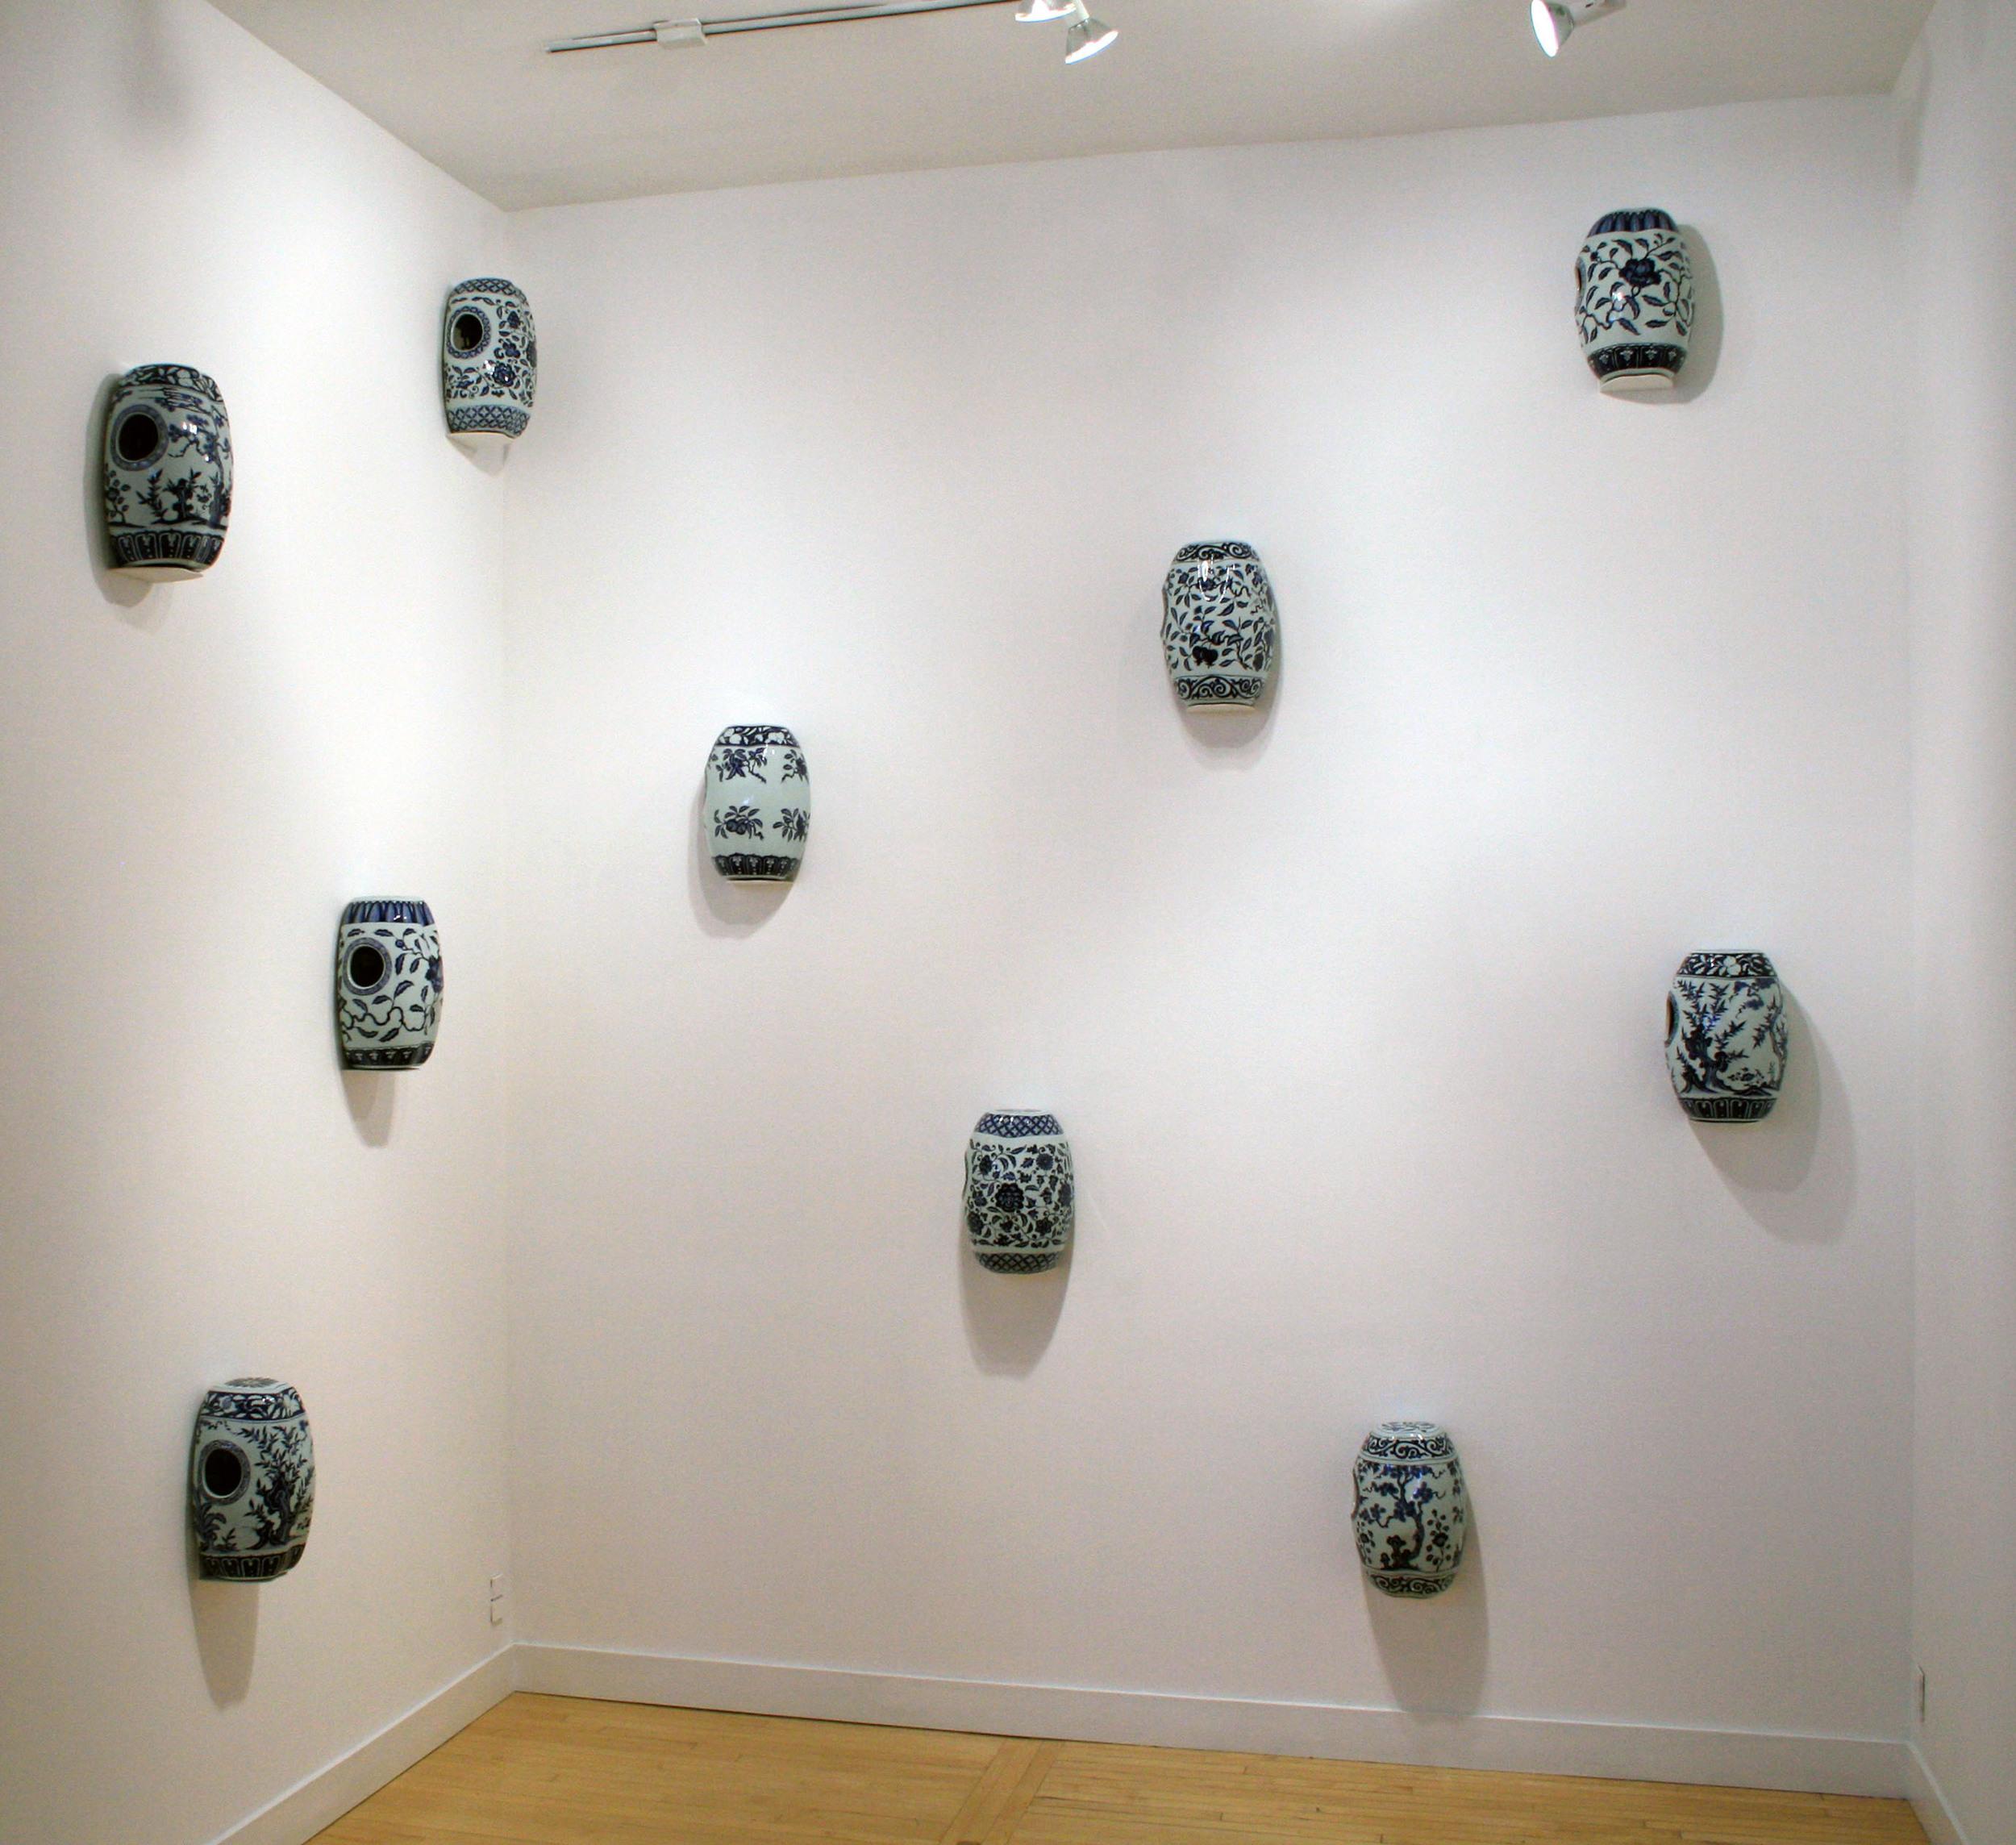 aw.2010.install.Owl 01.JPG